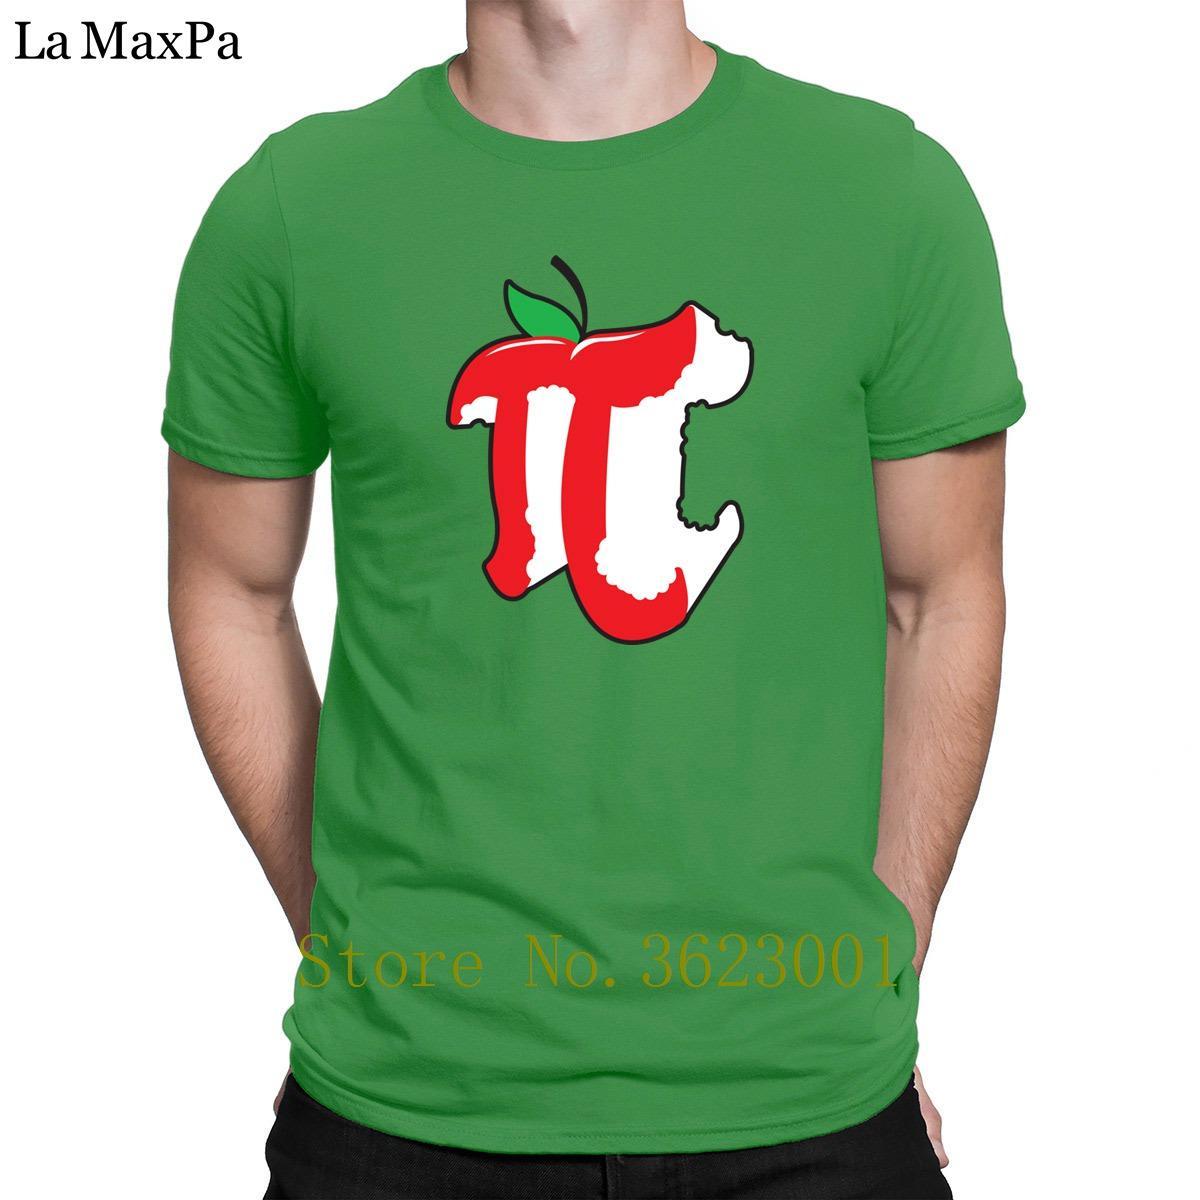 Impression Novelty T-shirt pour hommes Apple pi T-shirt pour les hommes Gents hommes de Nice T-shirt impressionnant T-shirt col pour Hommes Round Top Tee